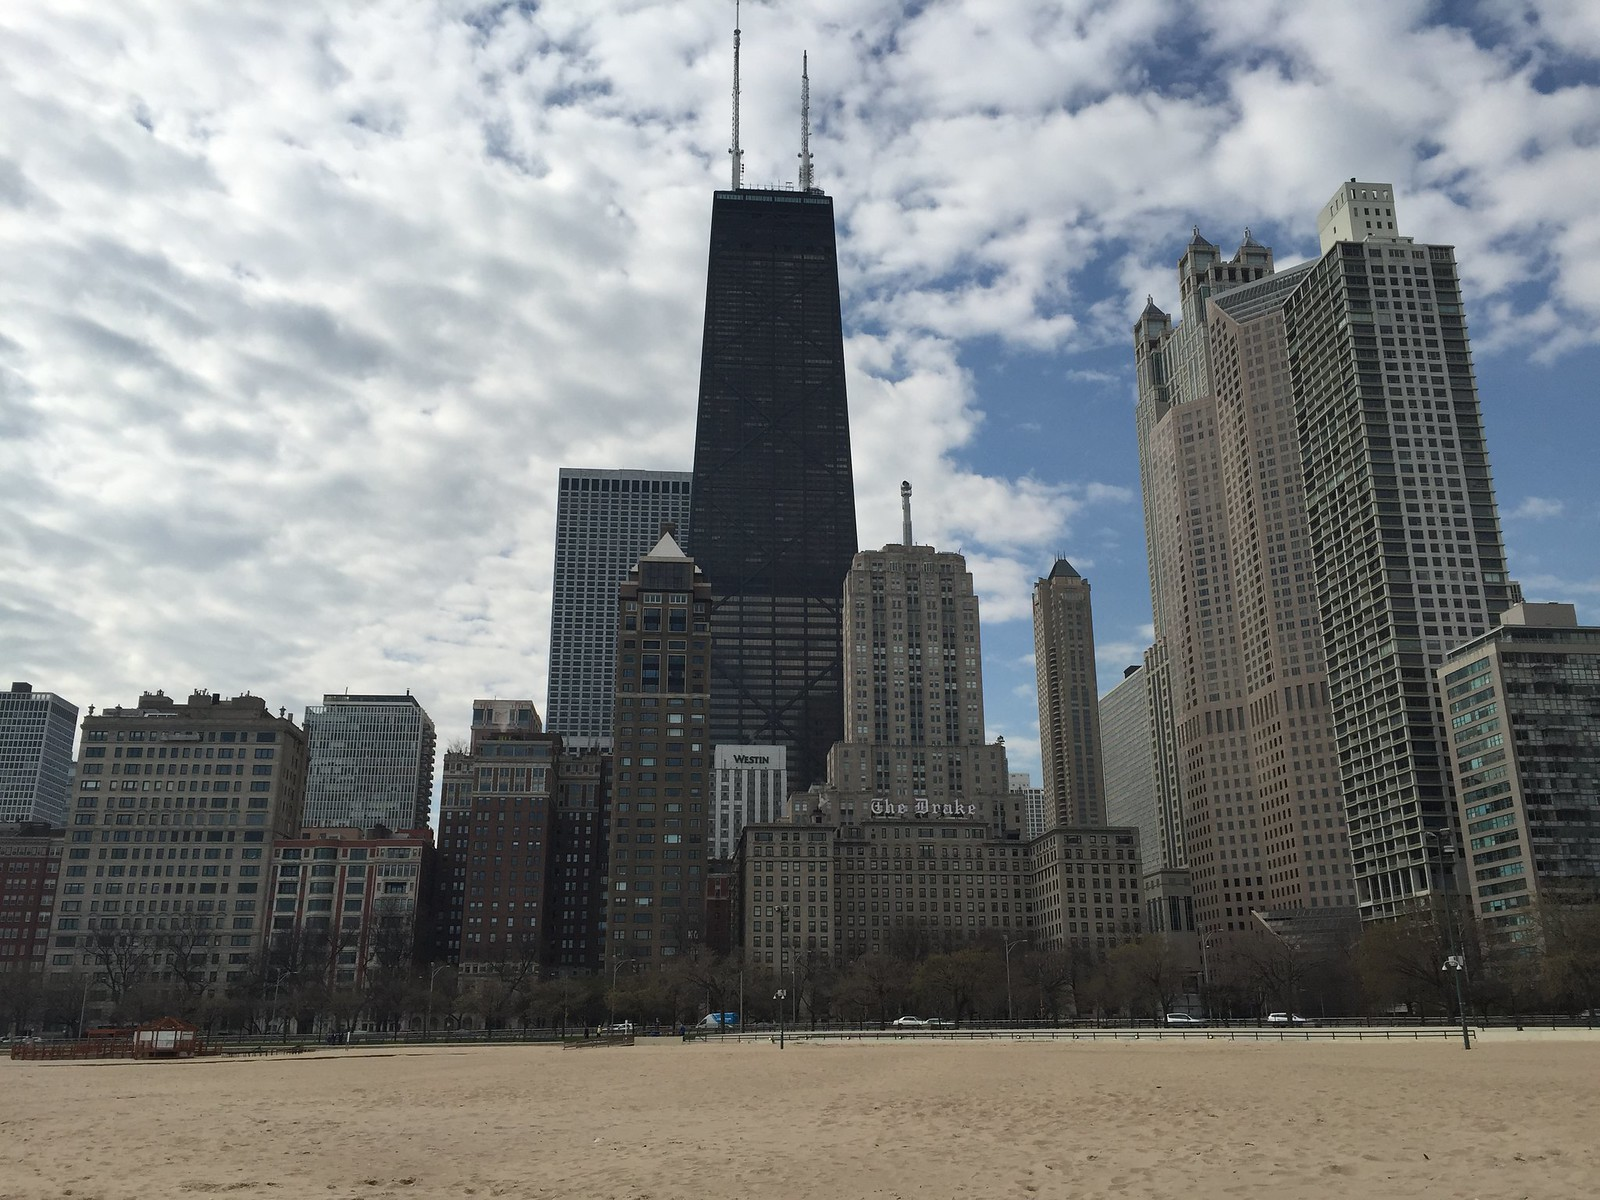 Chicago 24-04-2015 09-25-35